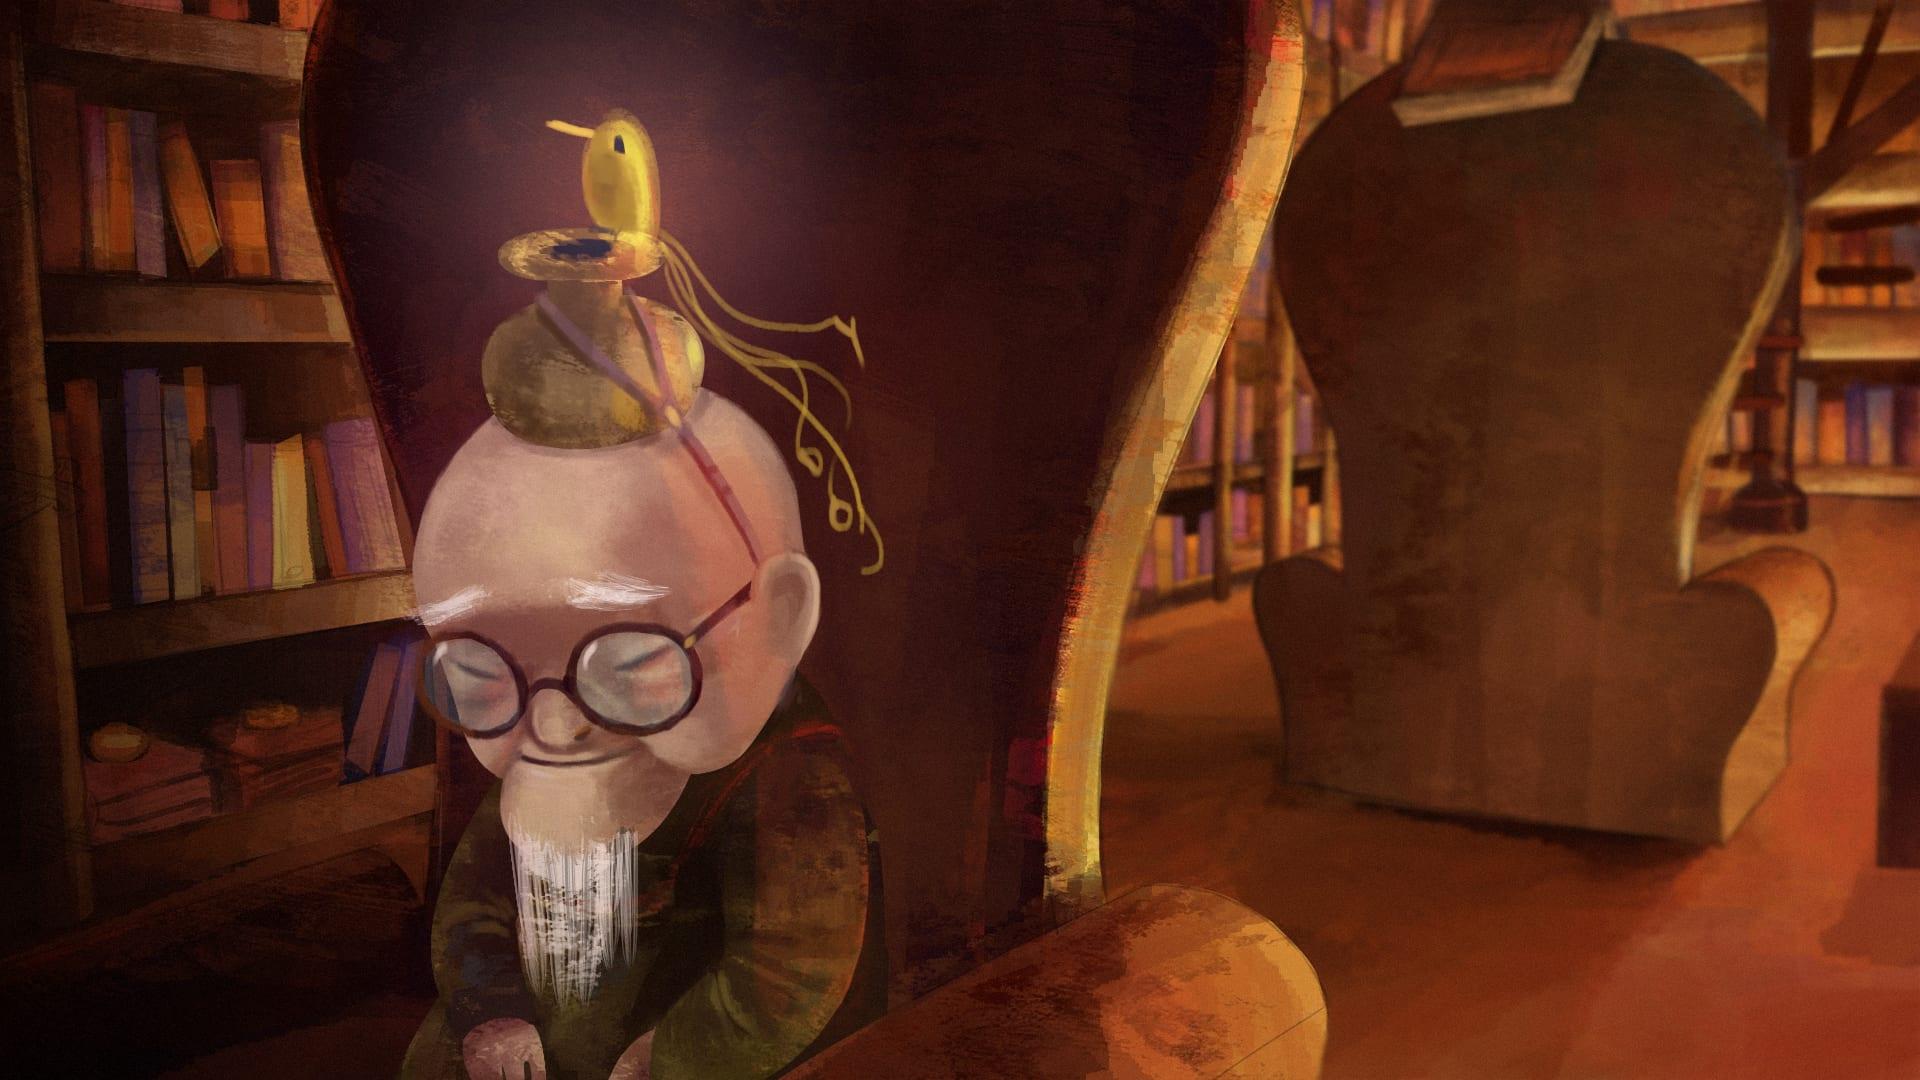 Animation (MA) postgraduate course - AUB